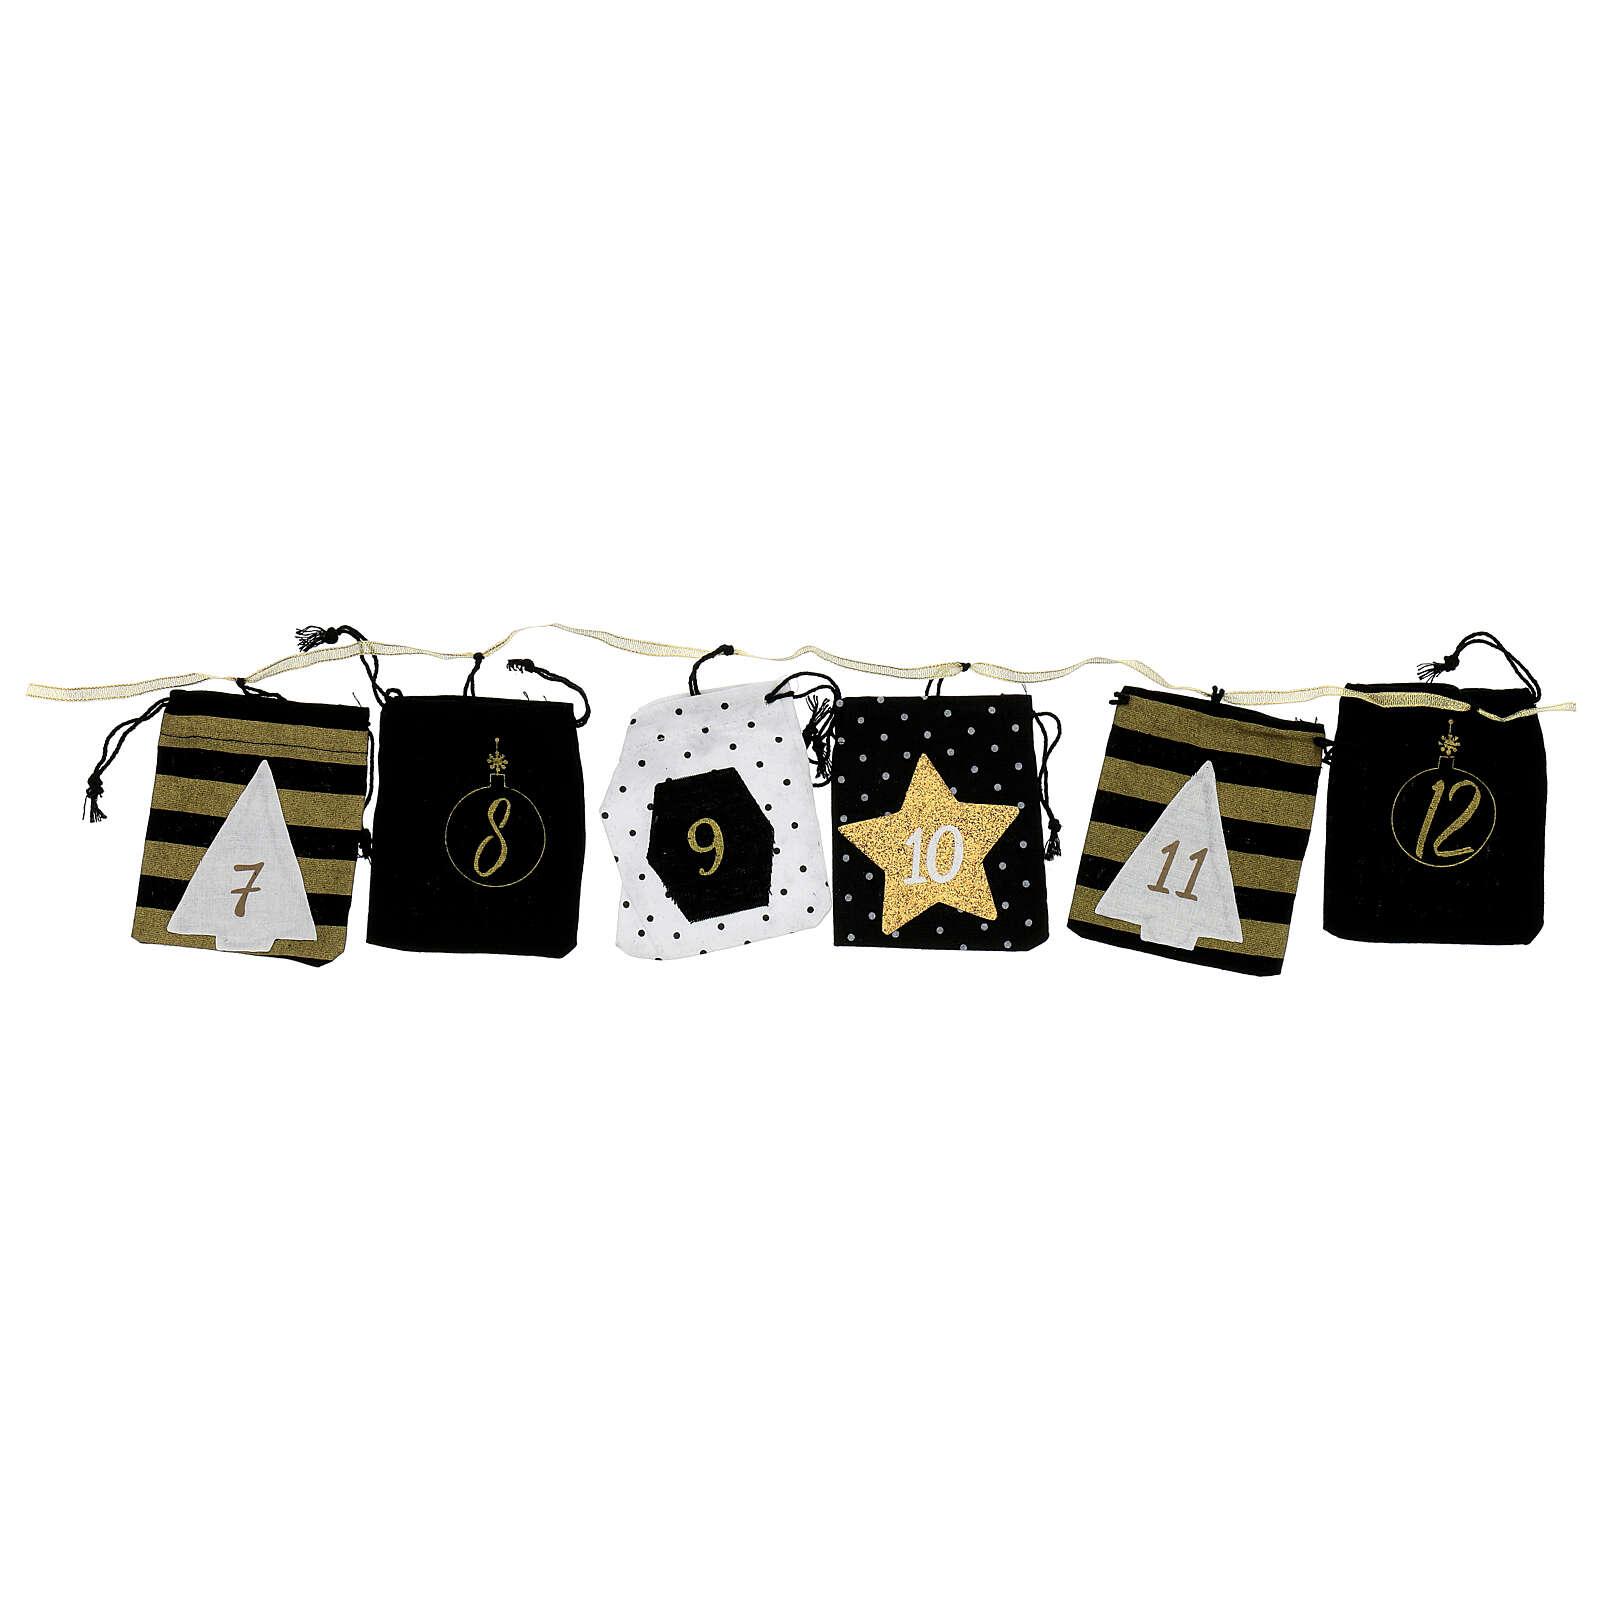 Advent Calendar cloth bags 10x12 cm 3